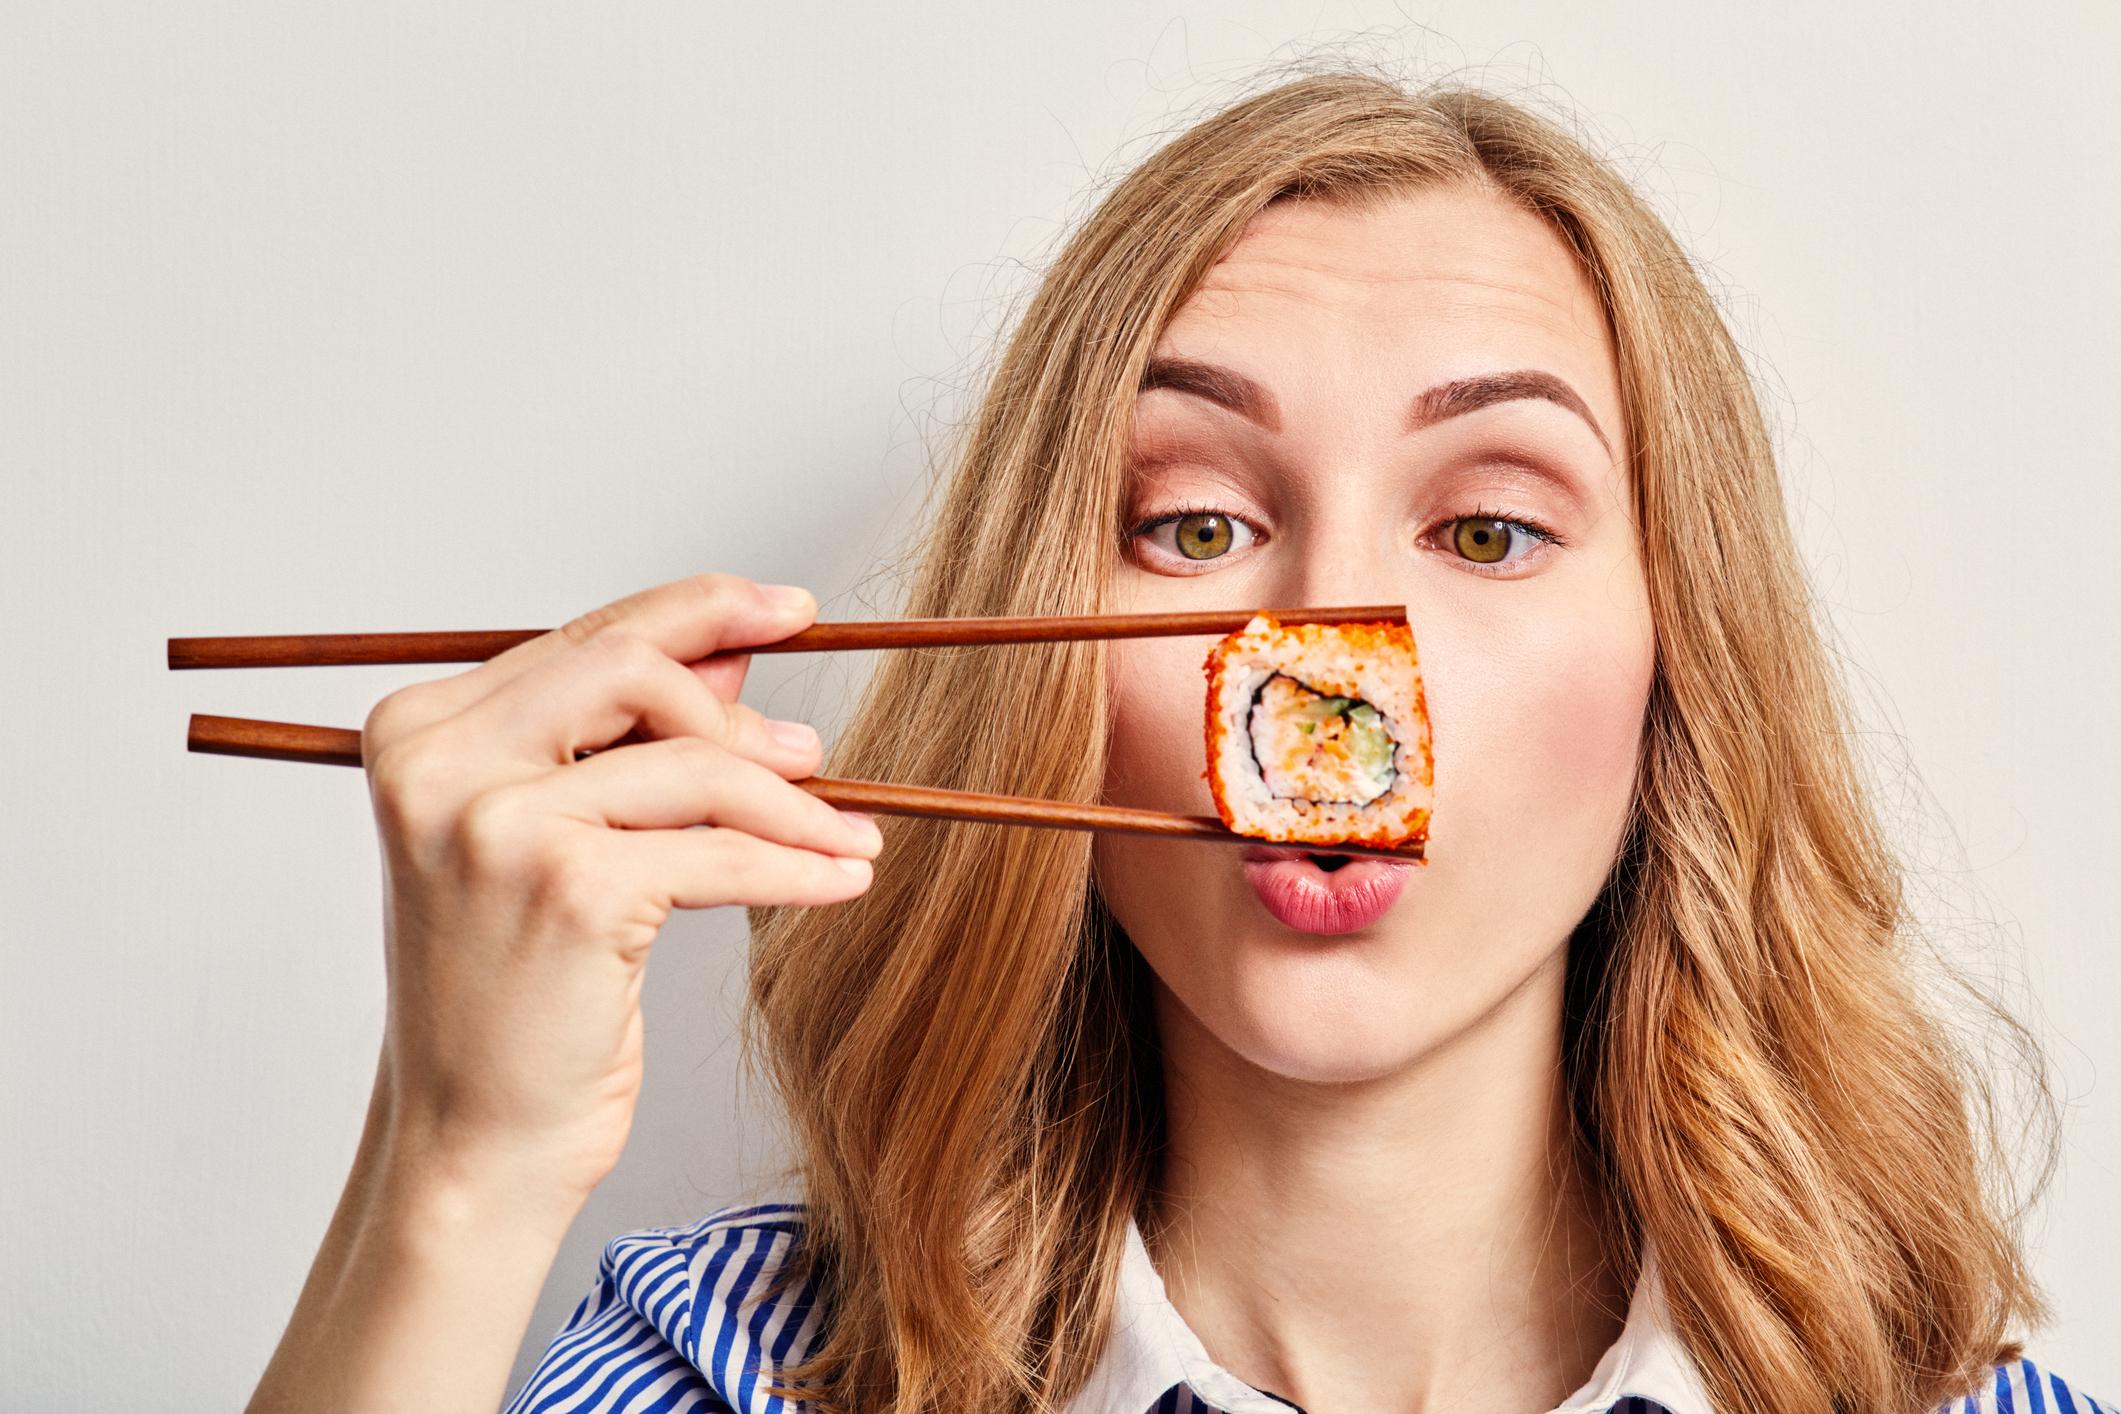 Er sushi sundt?